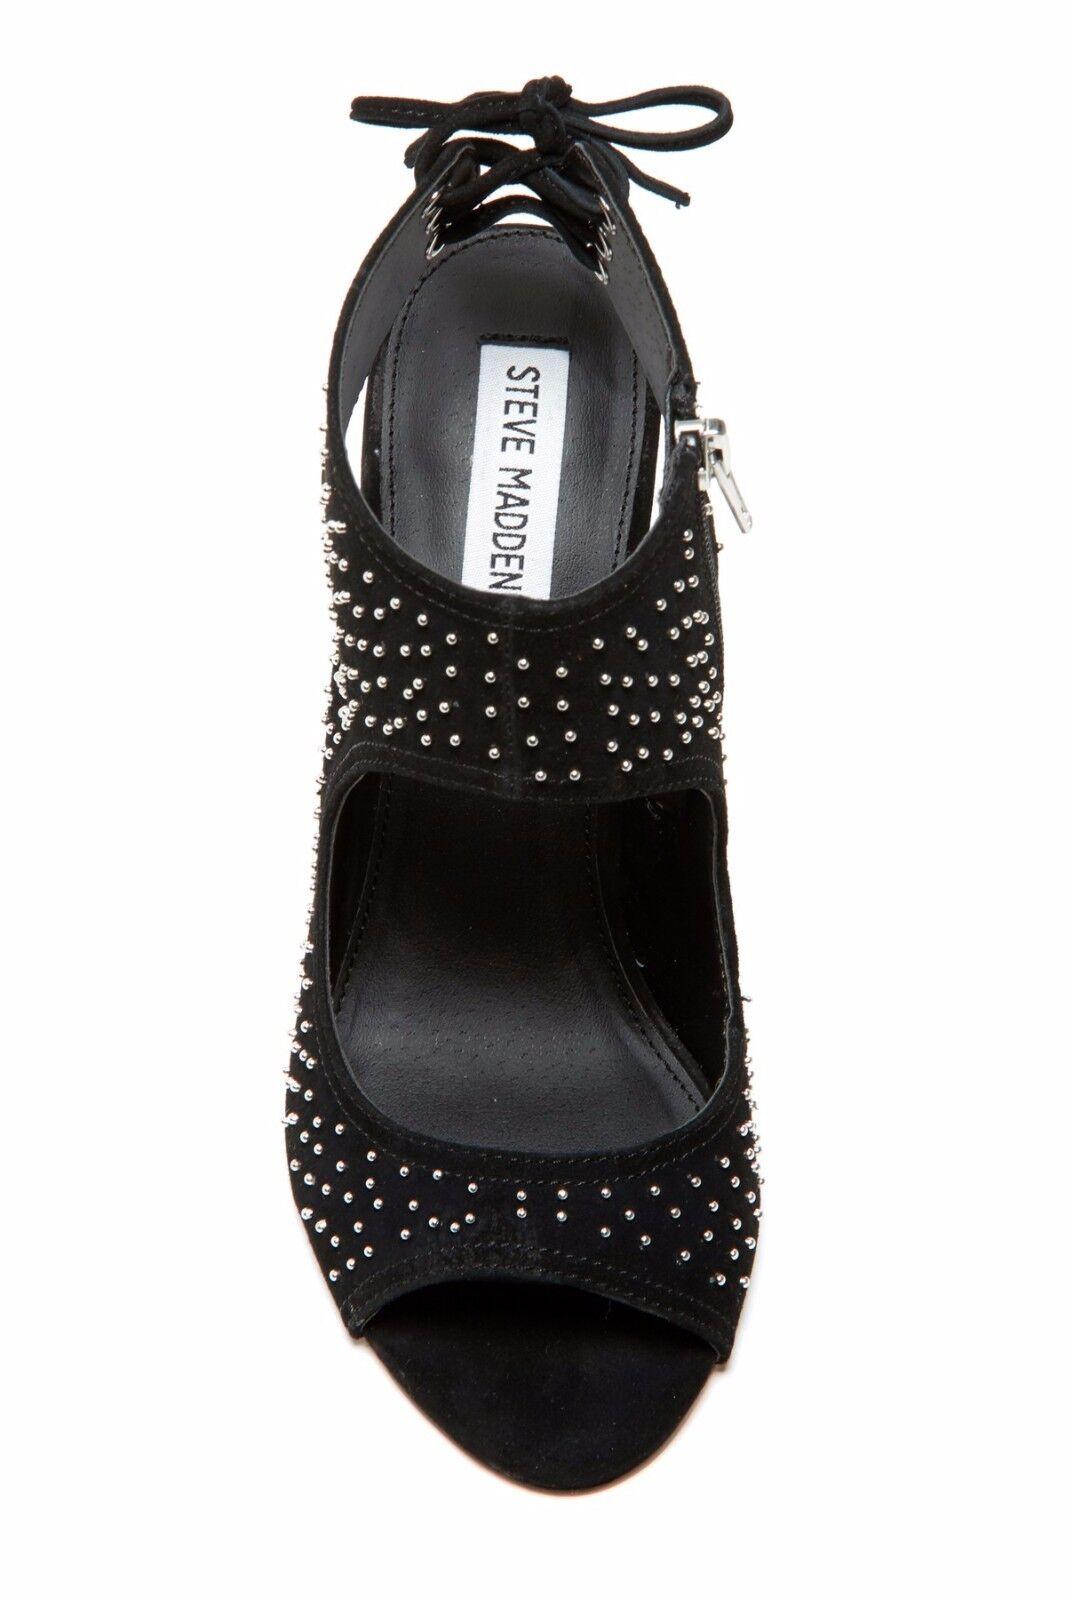 New Steve Madden Womens Seth Heeled Heeled Heeled Sandal shoes size 8.5 815961